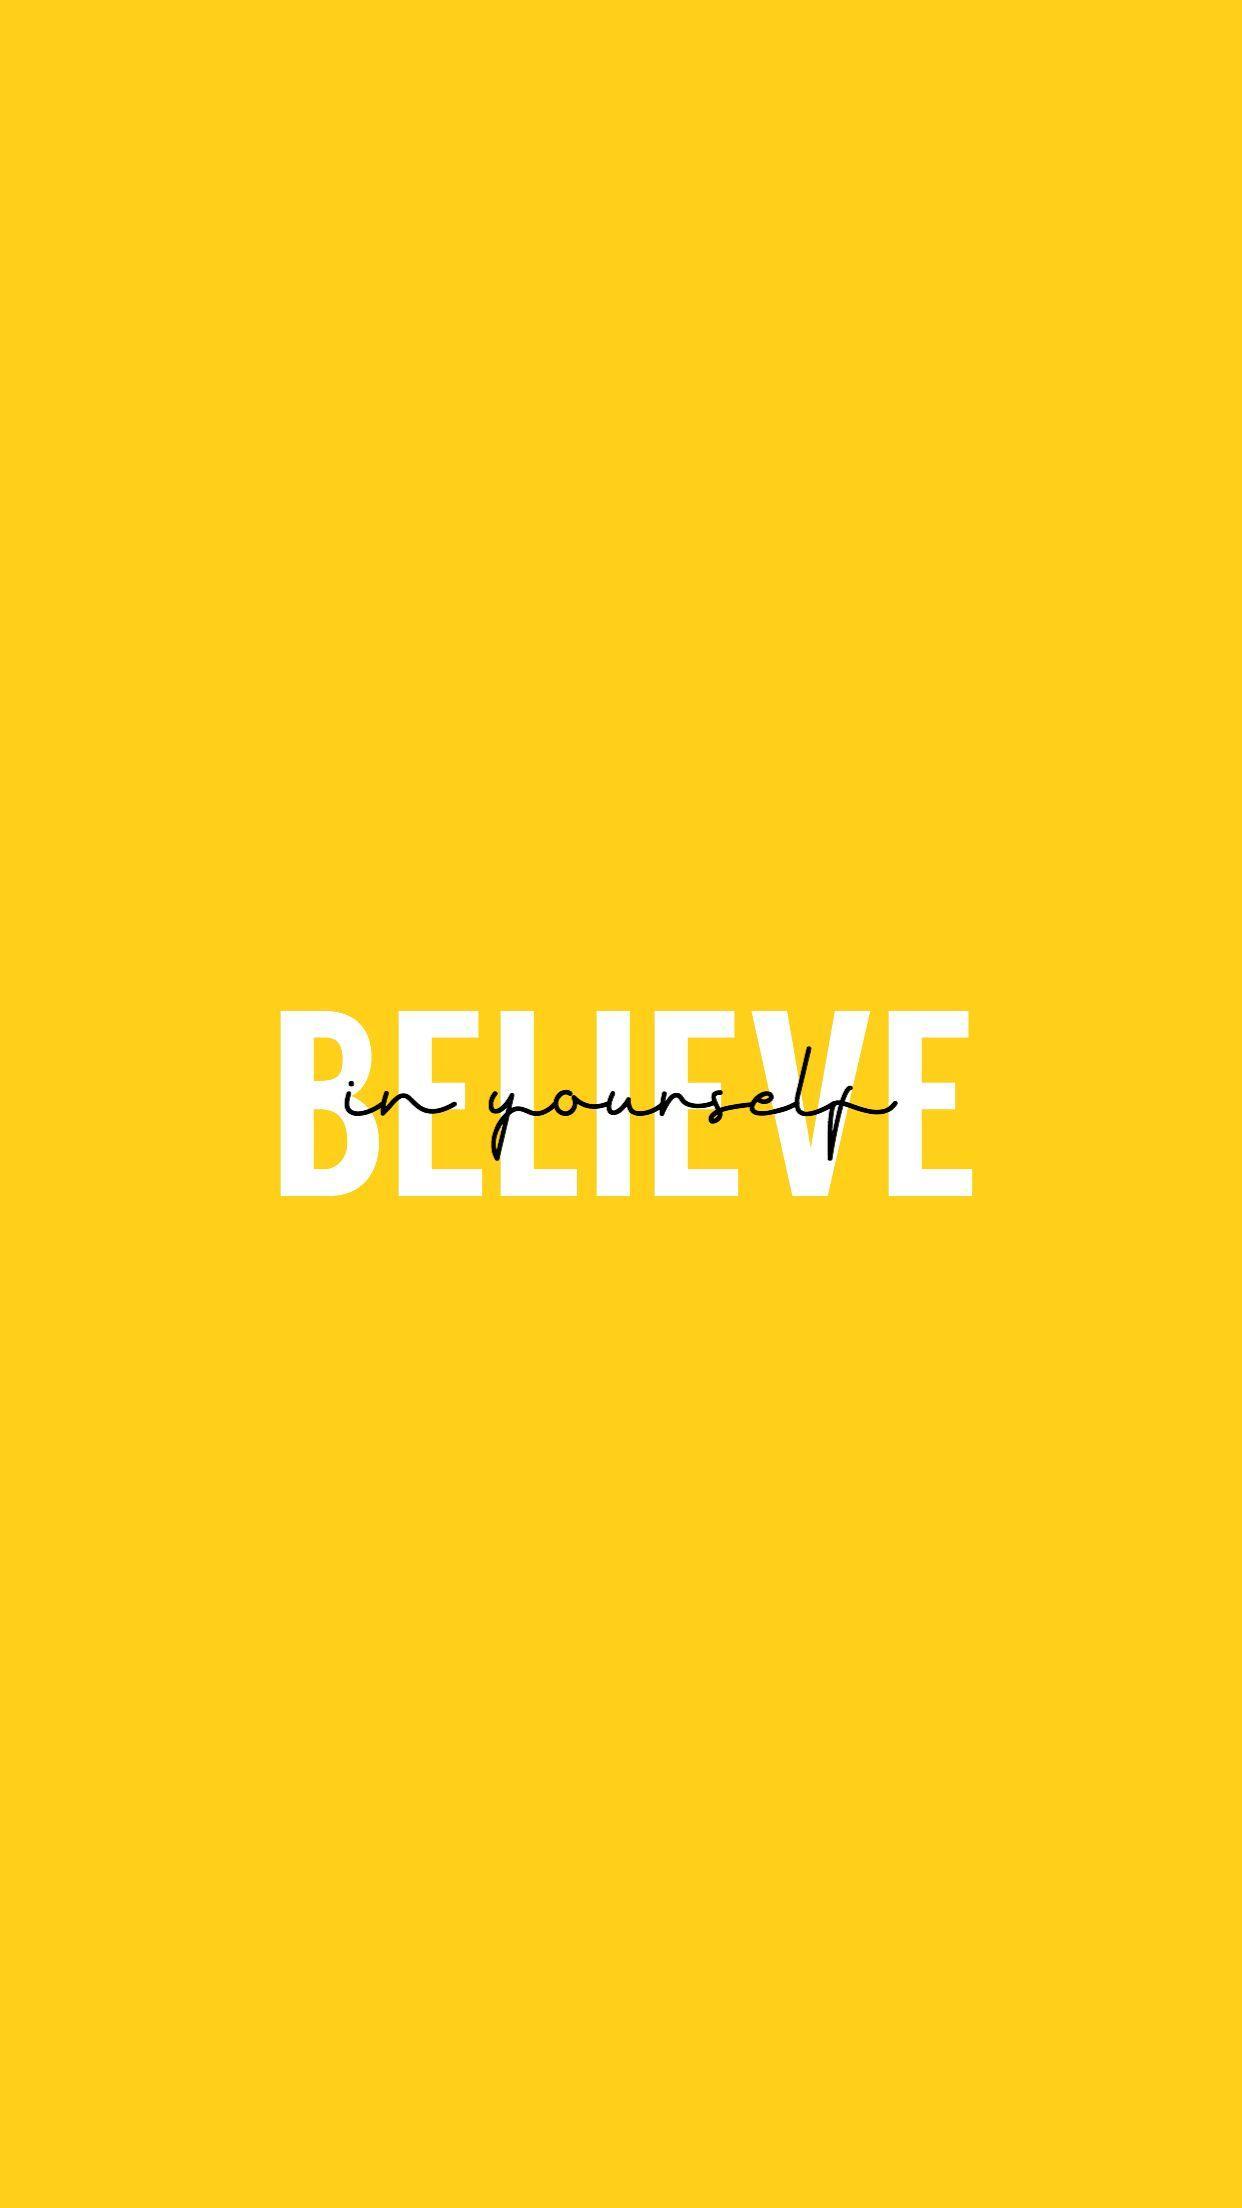 Believe In Yourself Wallpapers Wallpaper Cave